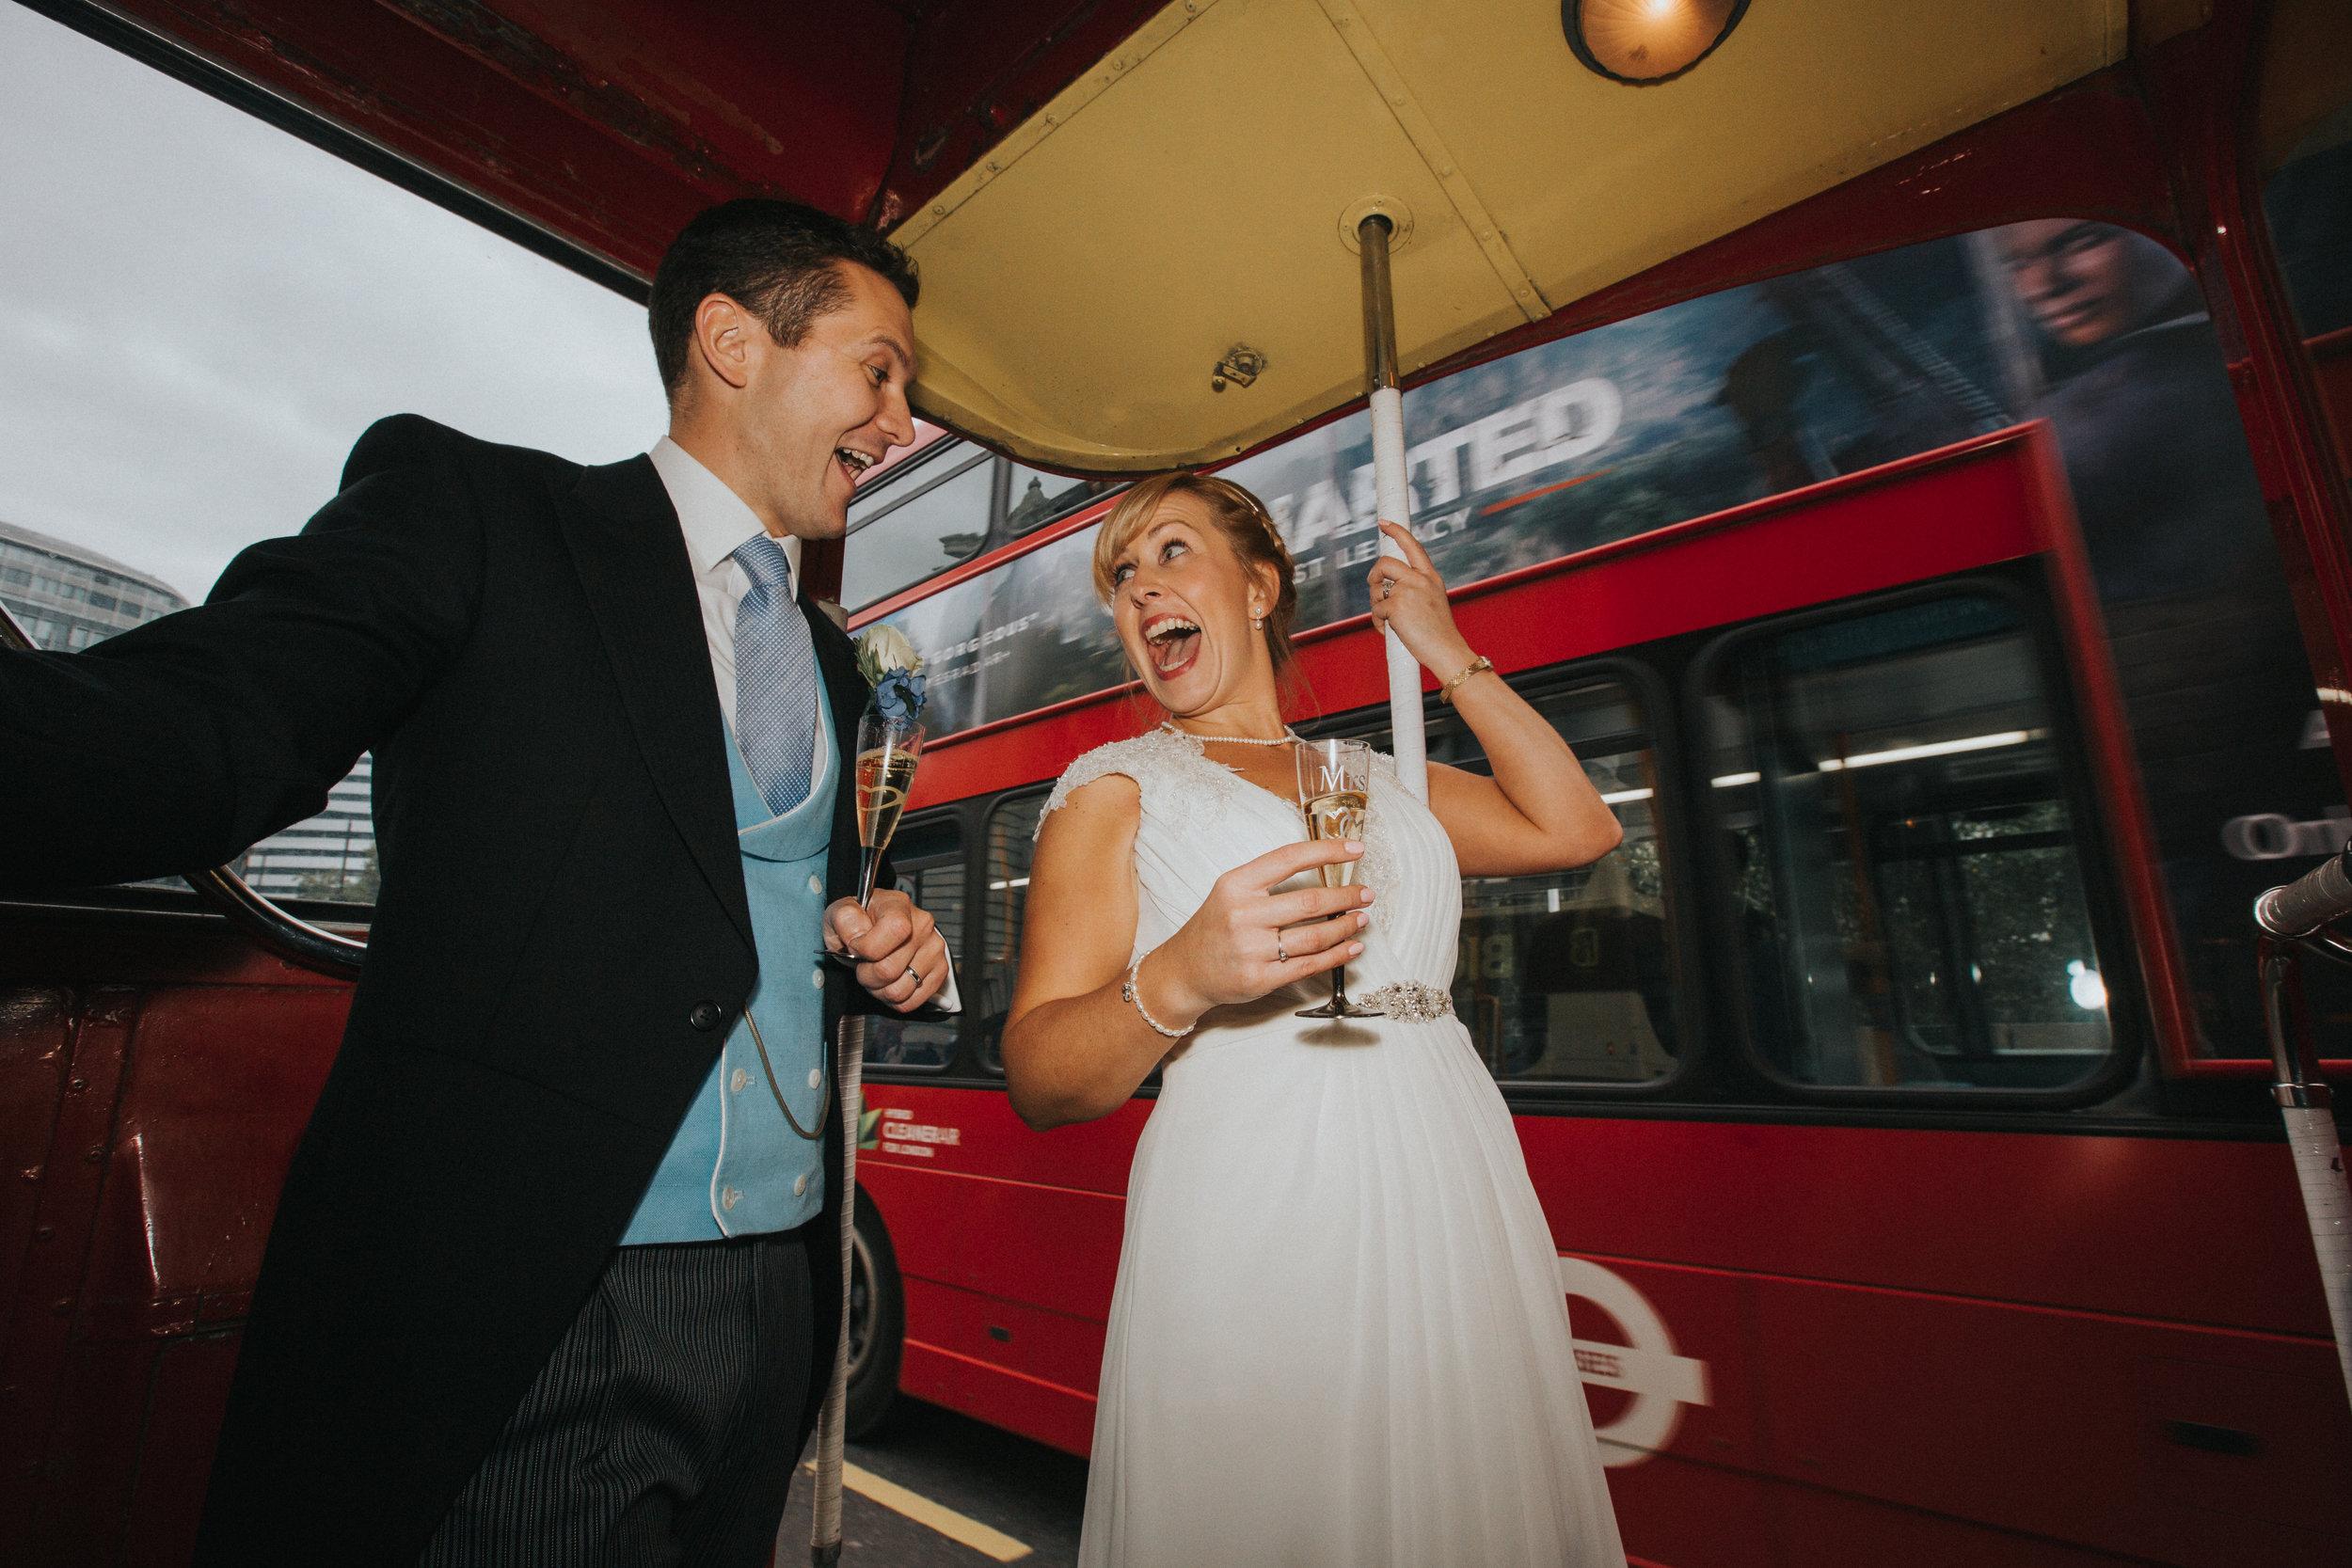 london-wedding-photography-wimbledon-wandsworth-town-hall-savoy-hotel-routemaster-62